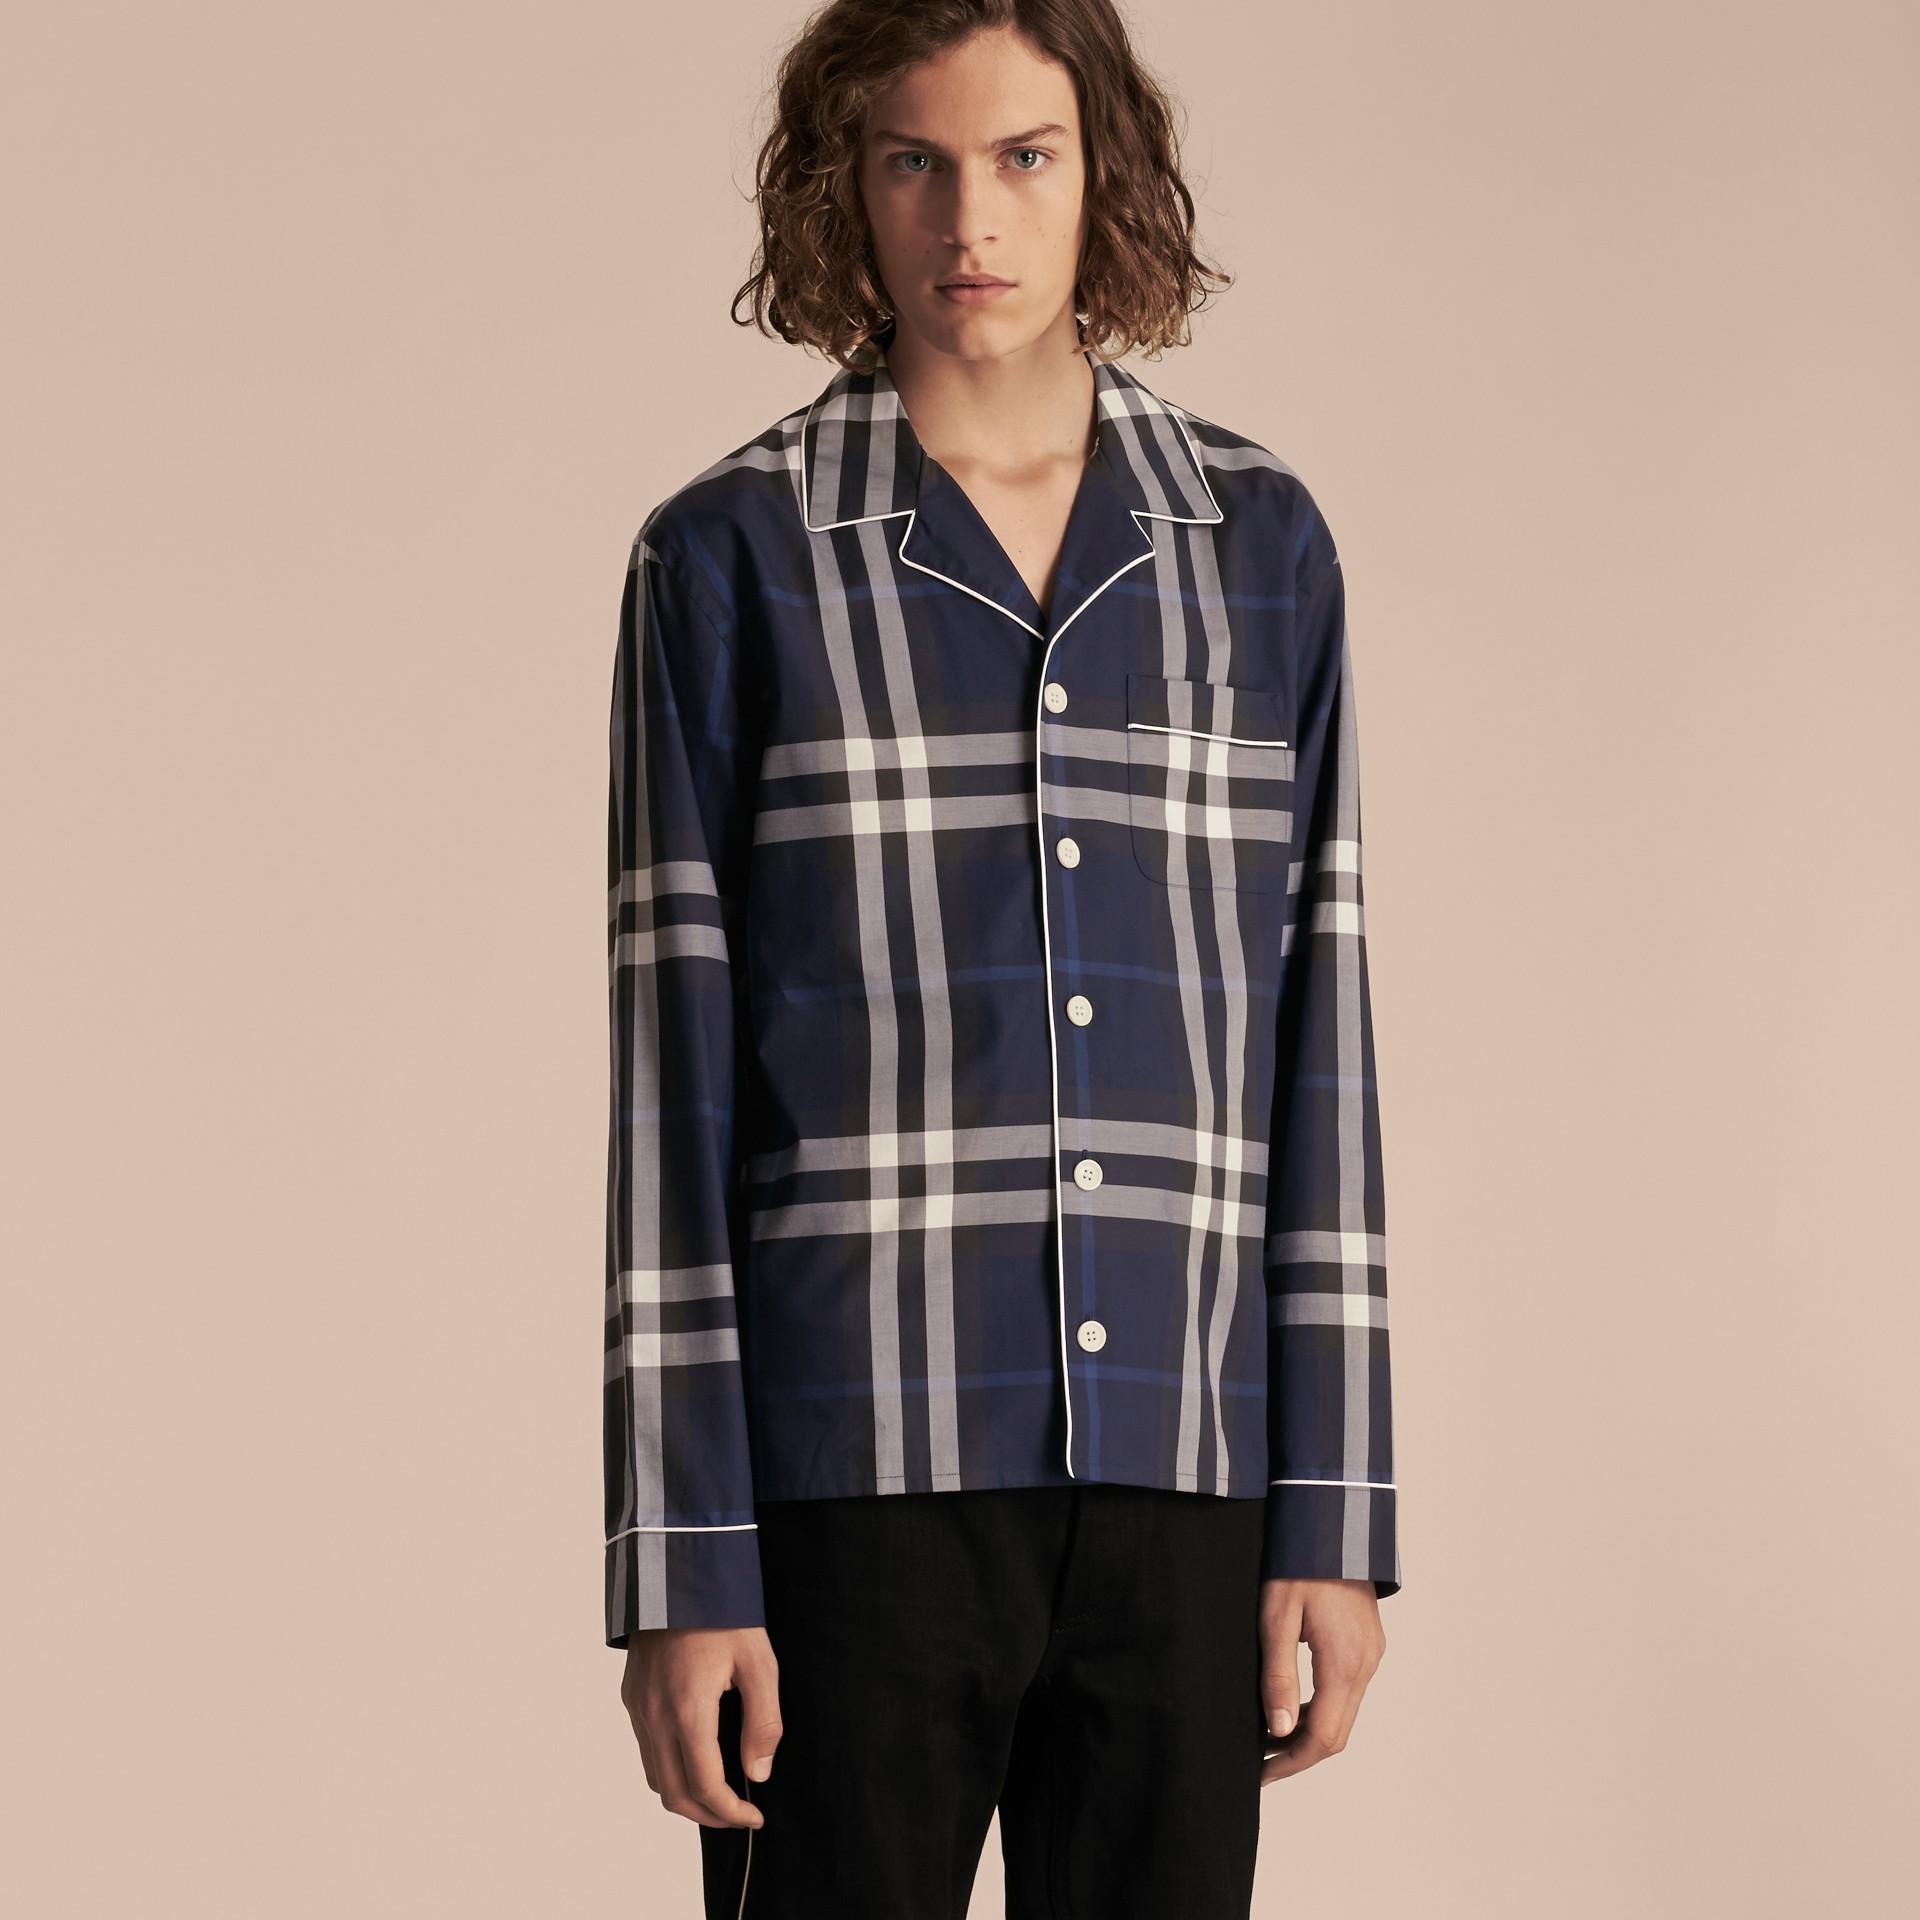 Indigo blue Check Cotton Pyjama-style Shirt Indigo Blue - gallery image 6